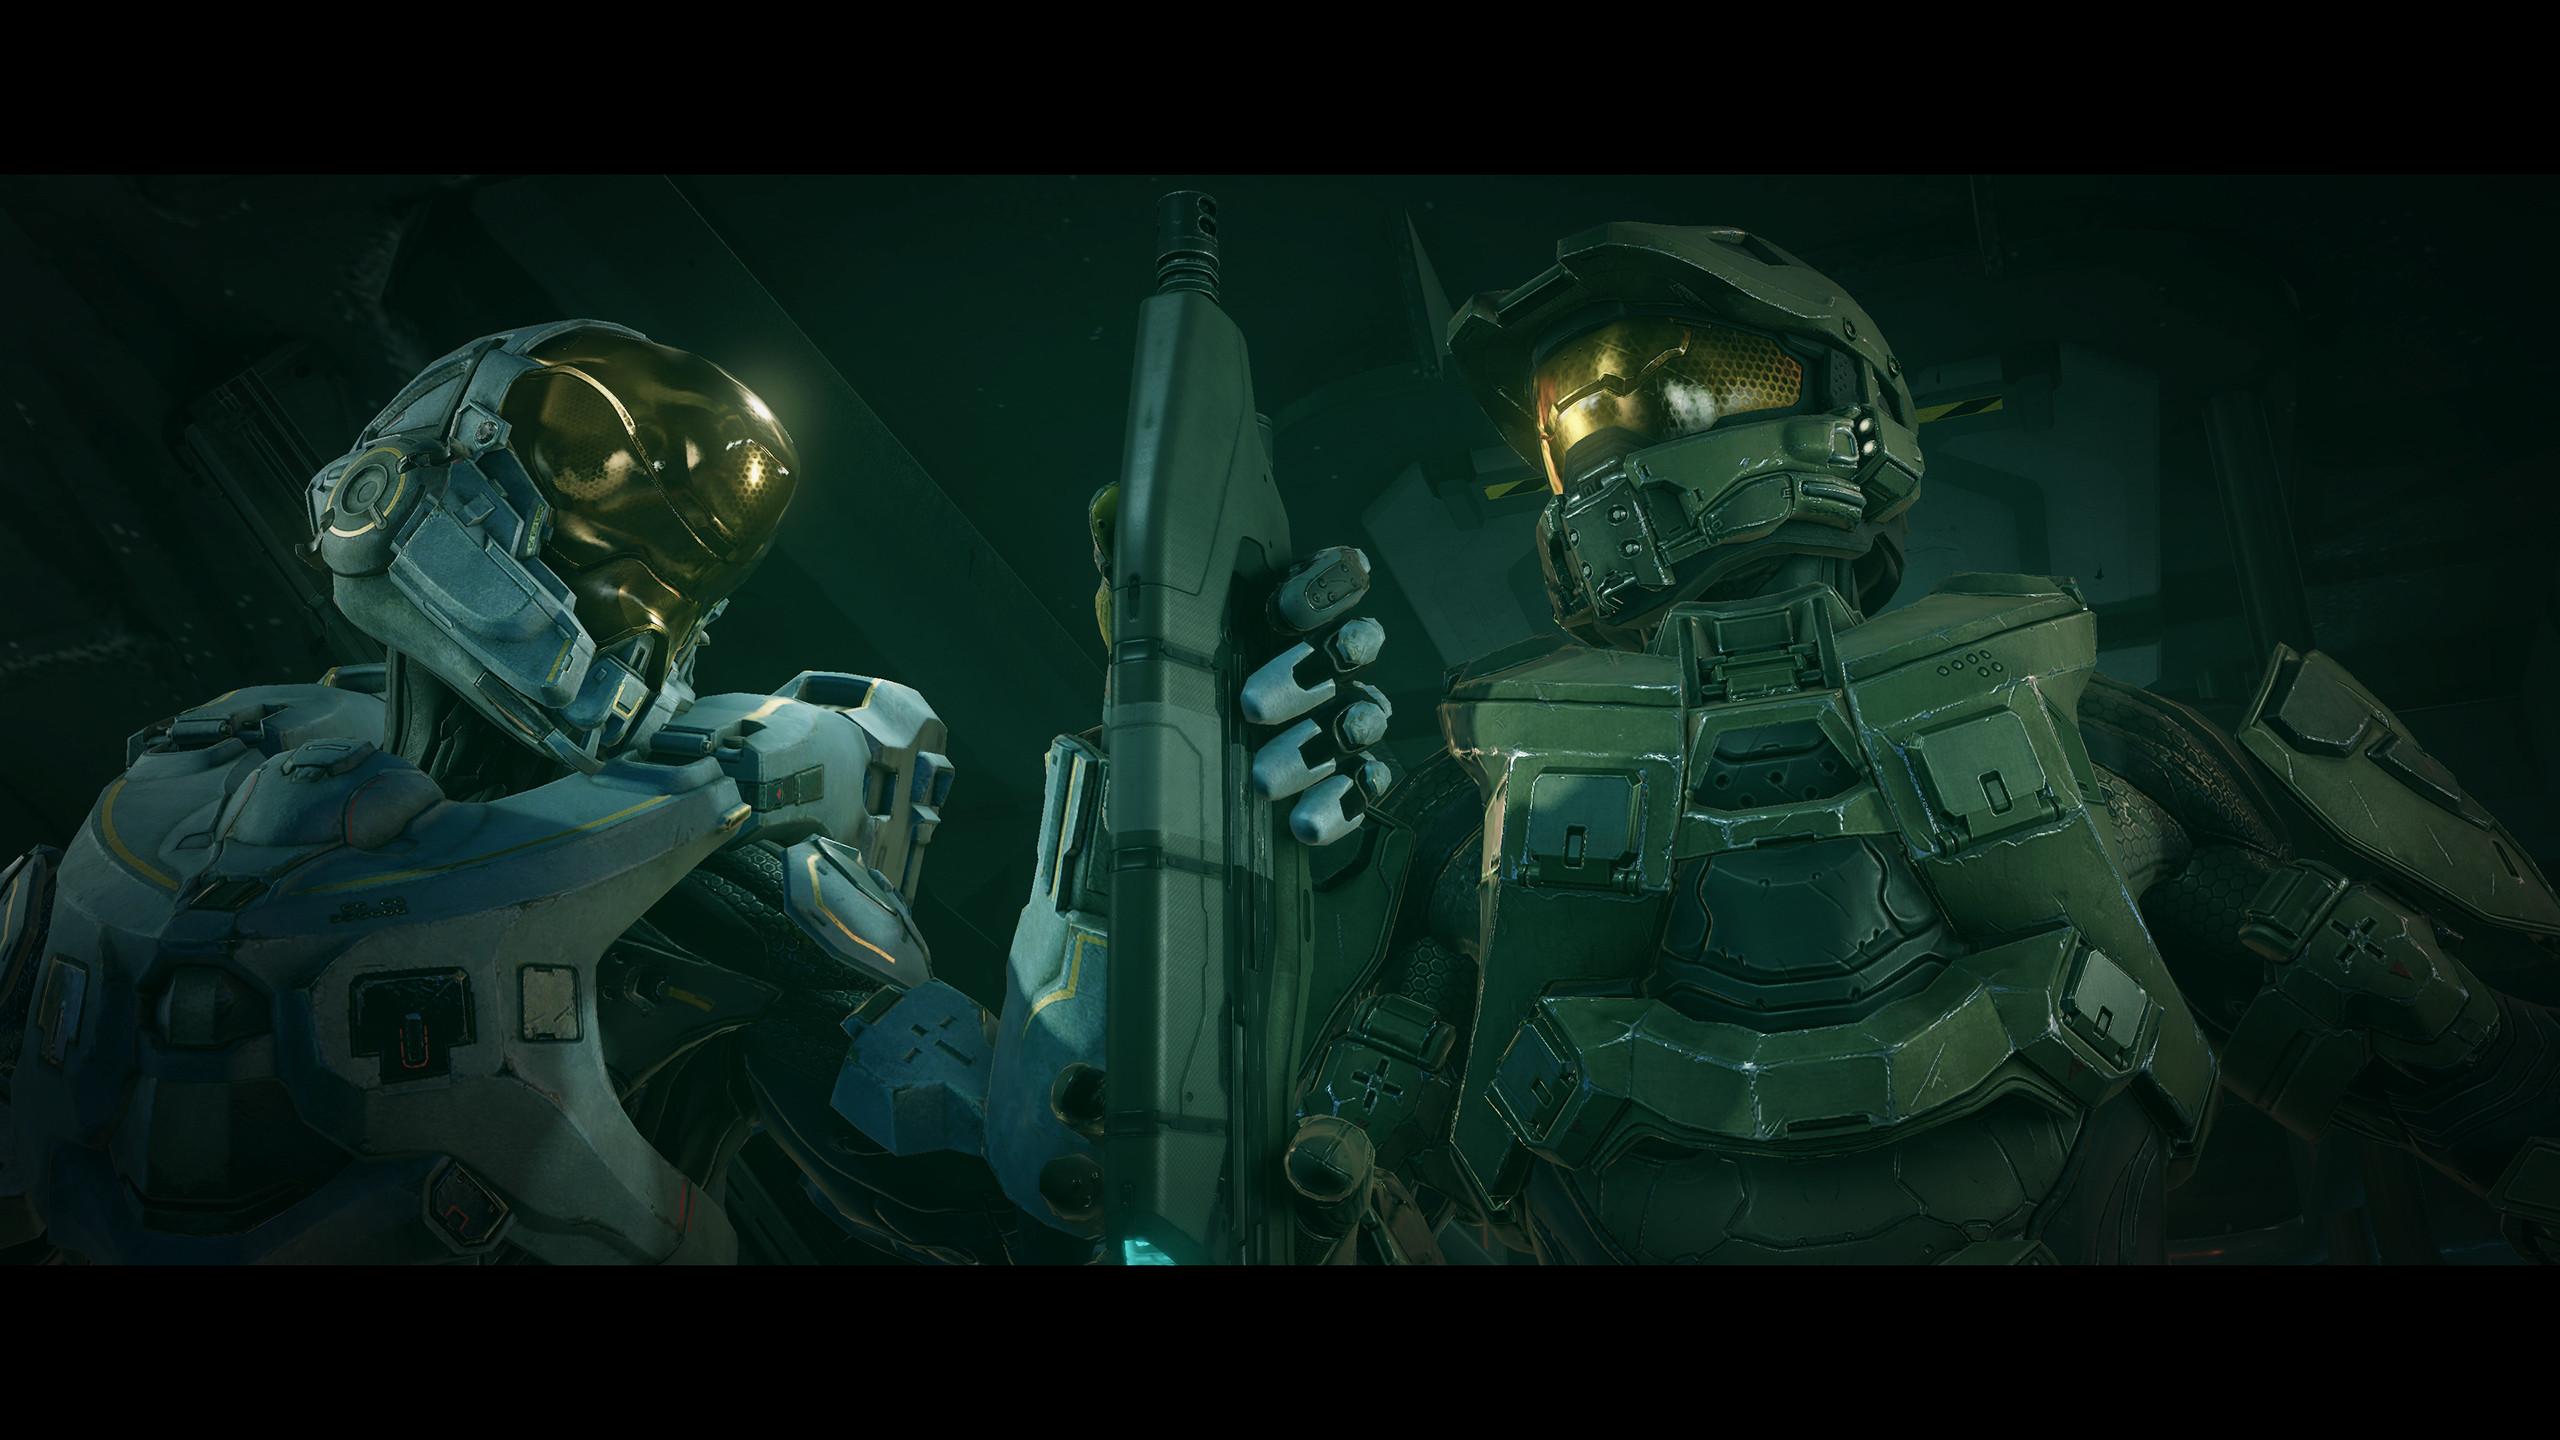 H5G-Cinematic-Blue-Team-jpg H5G-Cinematic-I-Need-a-Weapon-jpg